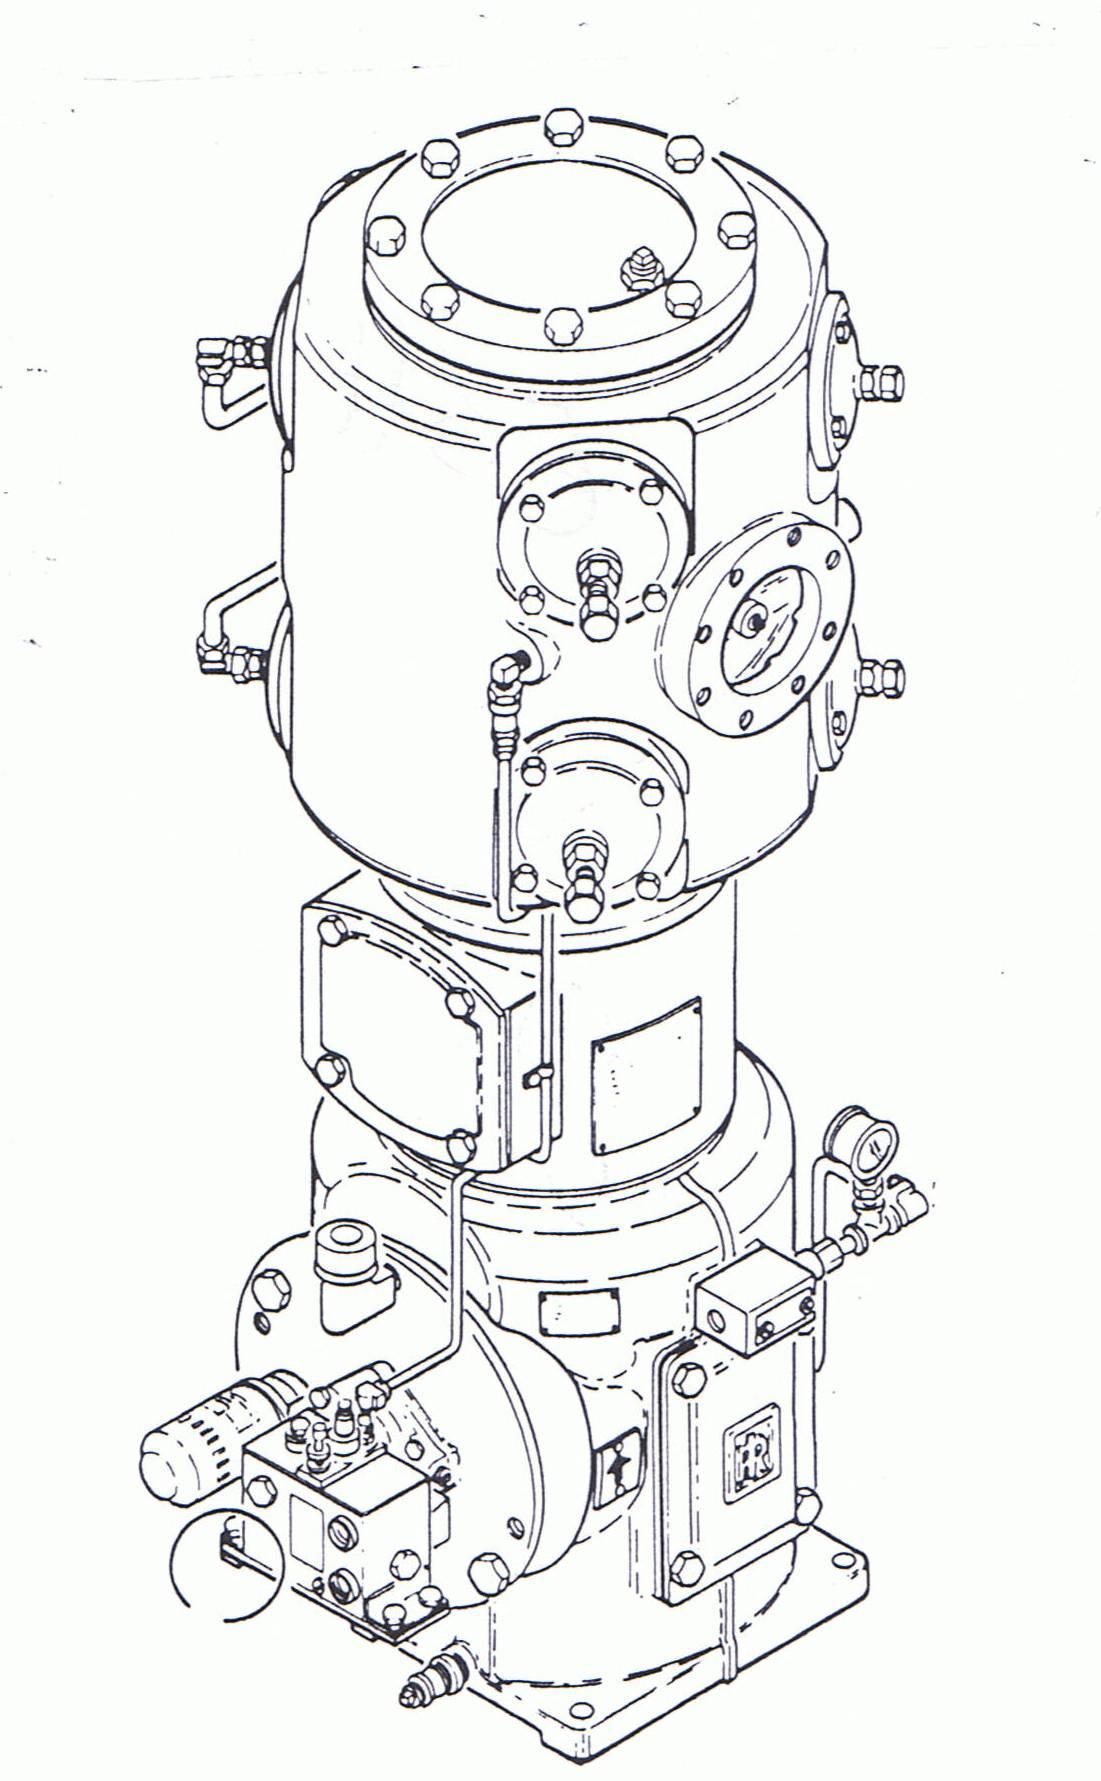 Air Power Esv Inventory